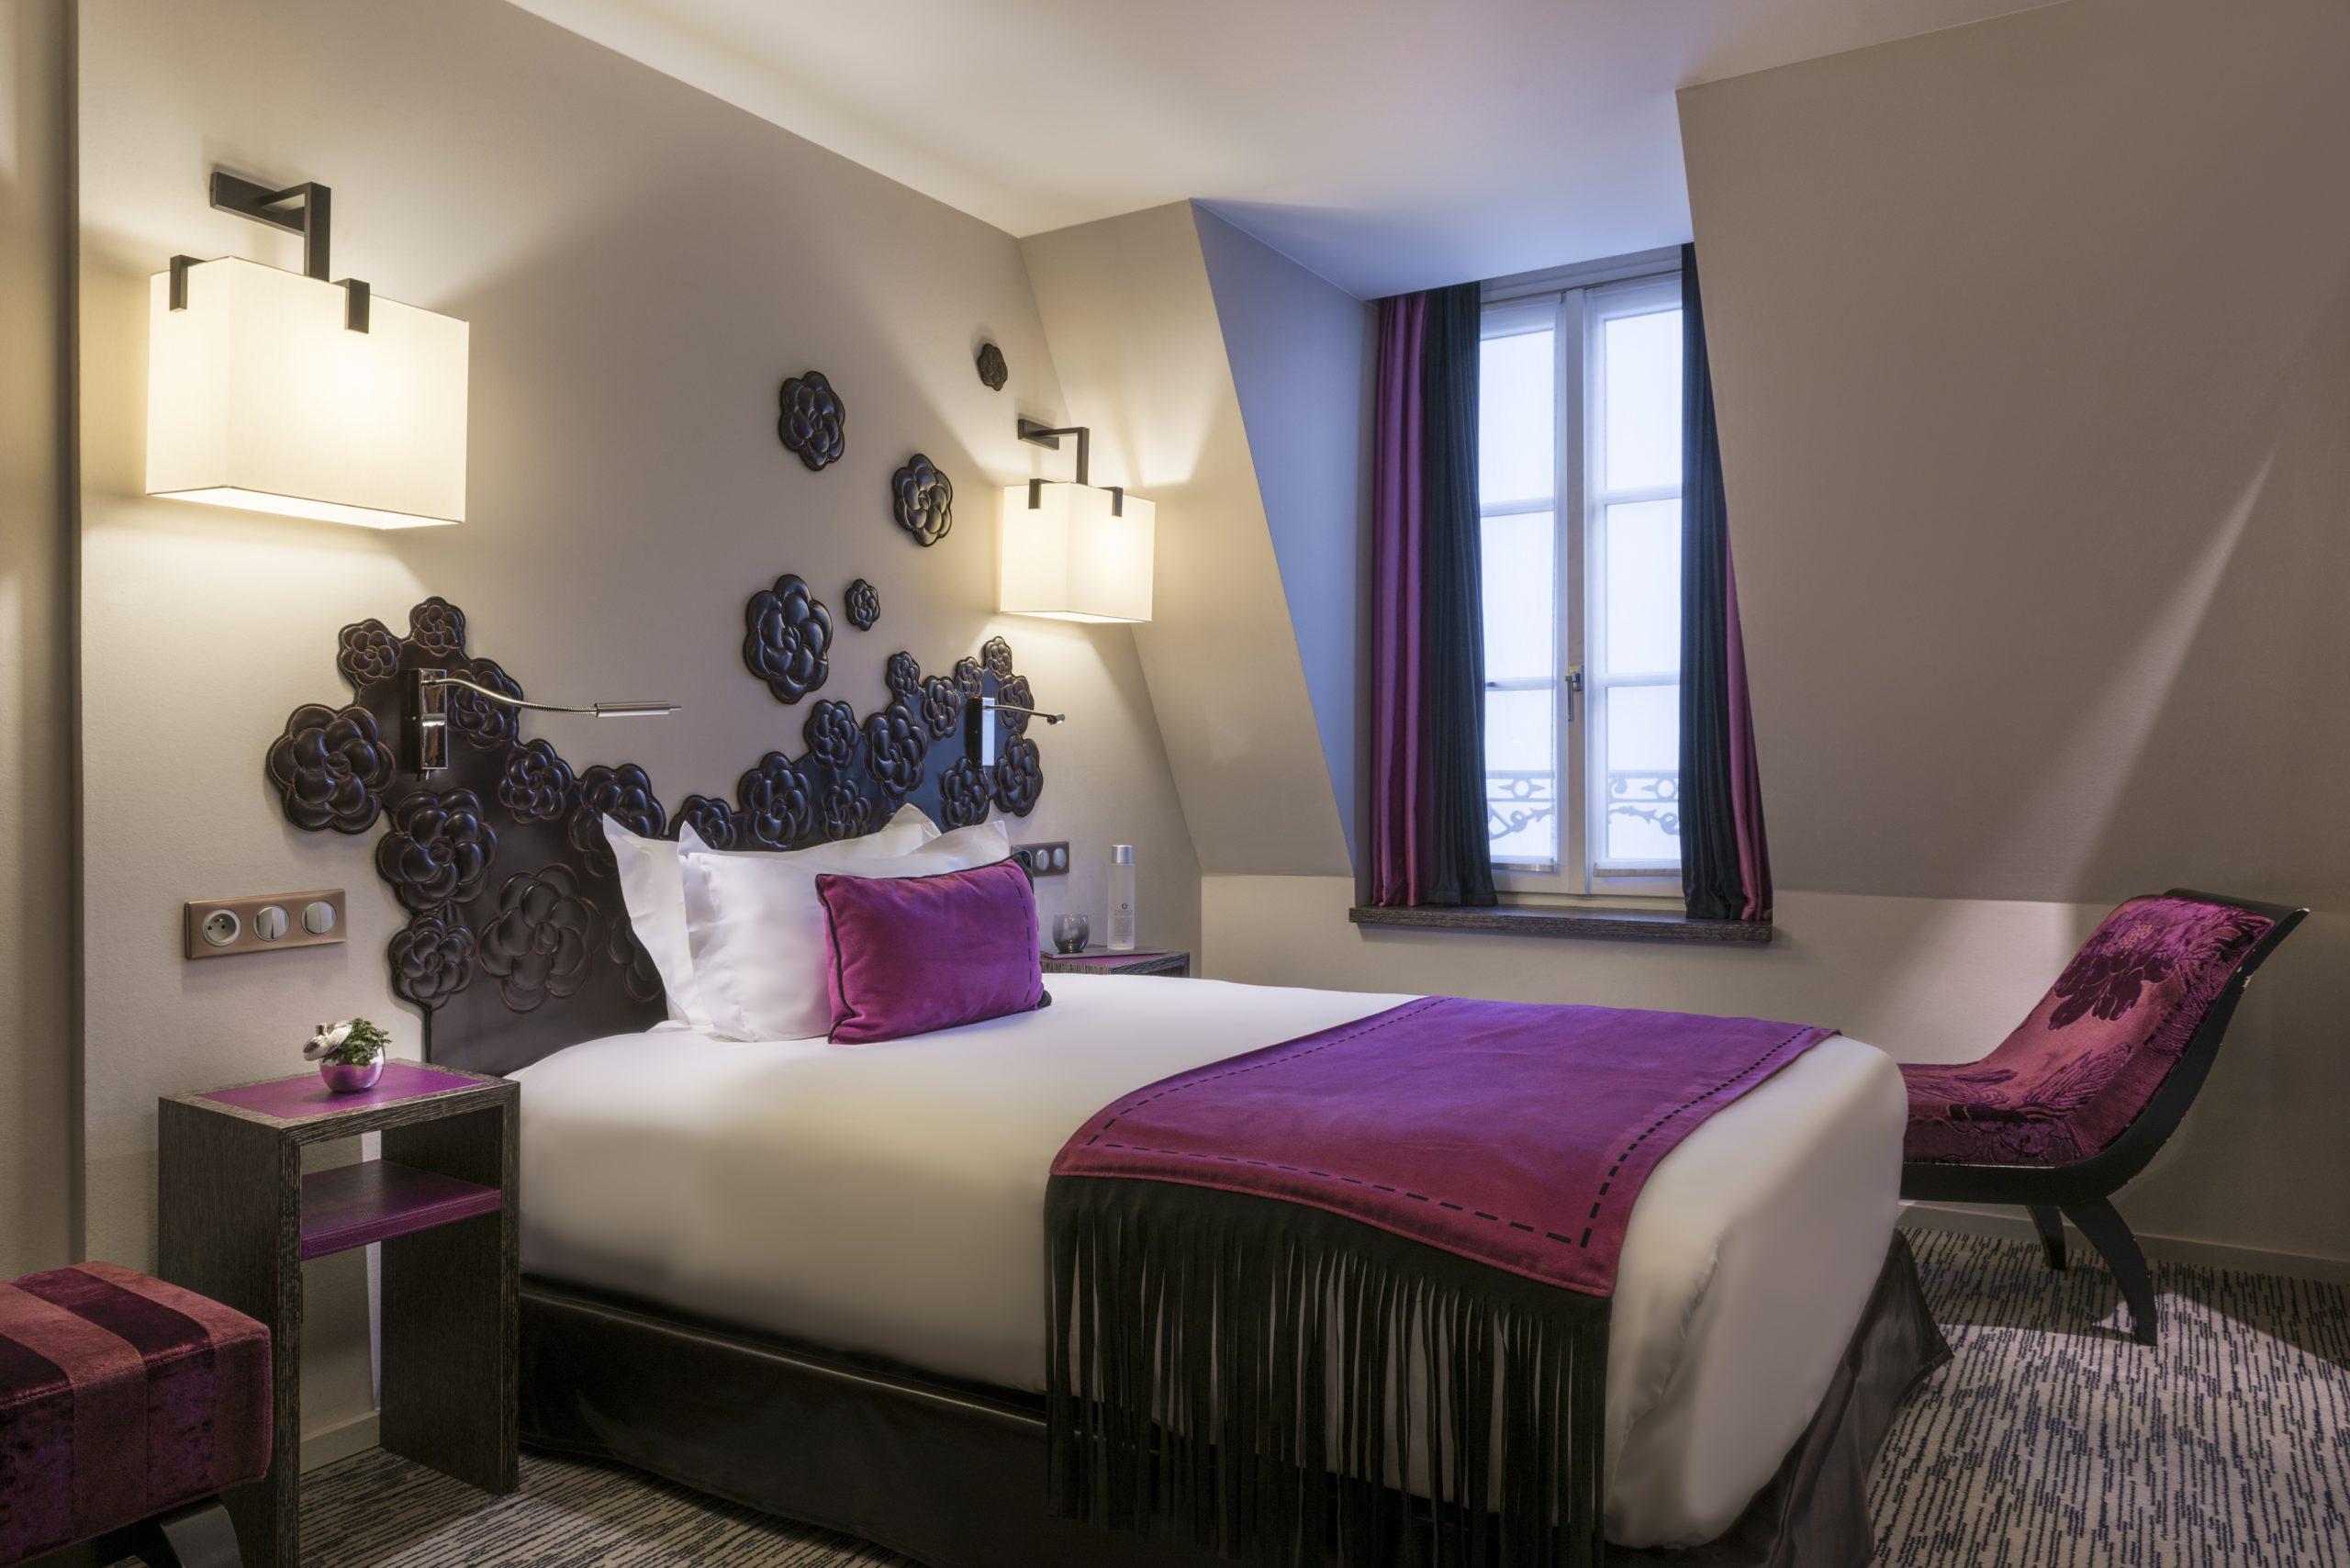 Hotel Les Jardins De La Villa   4 Star Hotel Rooms   Rooms ... tout Hotel Jardins De La Villa